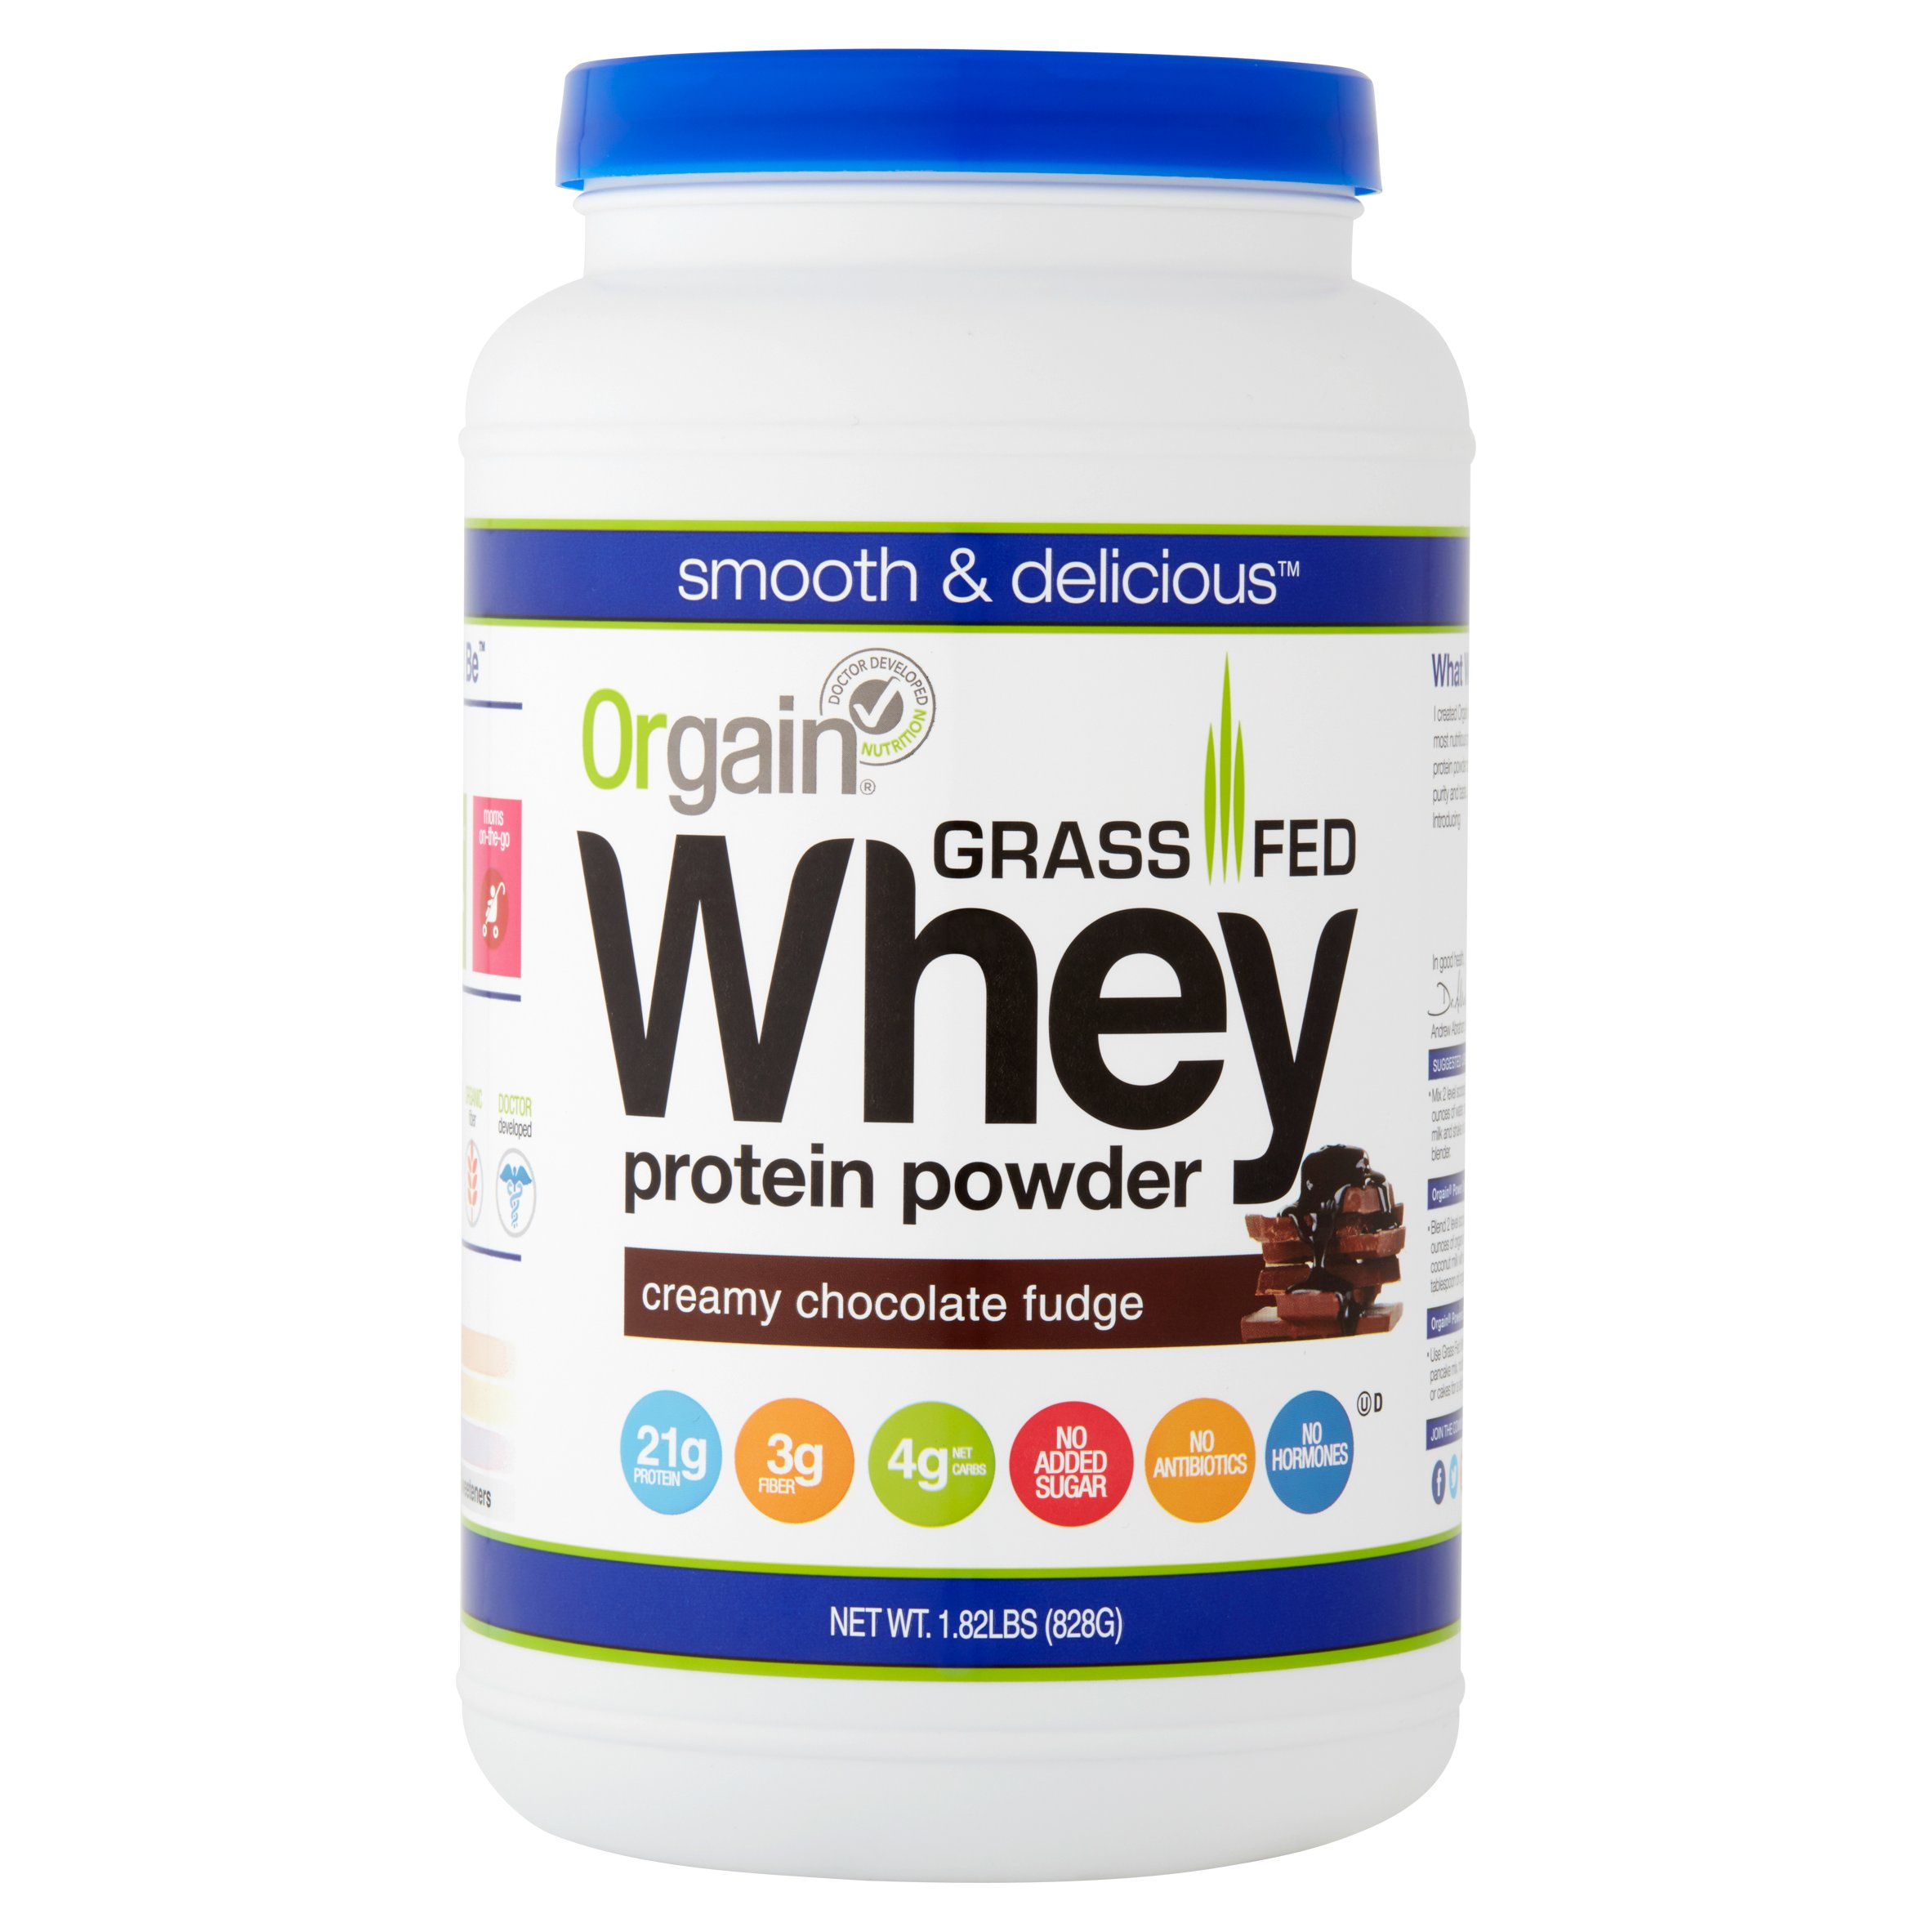 Orgain Grass Fed Whey Protein Powder, Chocolate, 21g Protein, 1.8 Lb ...